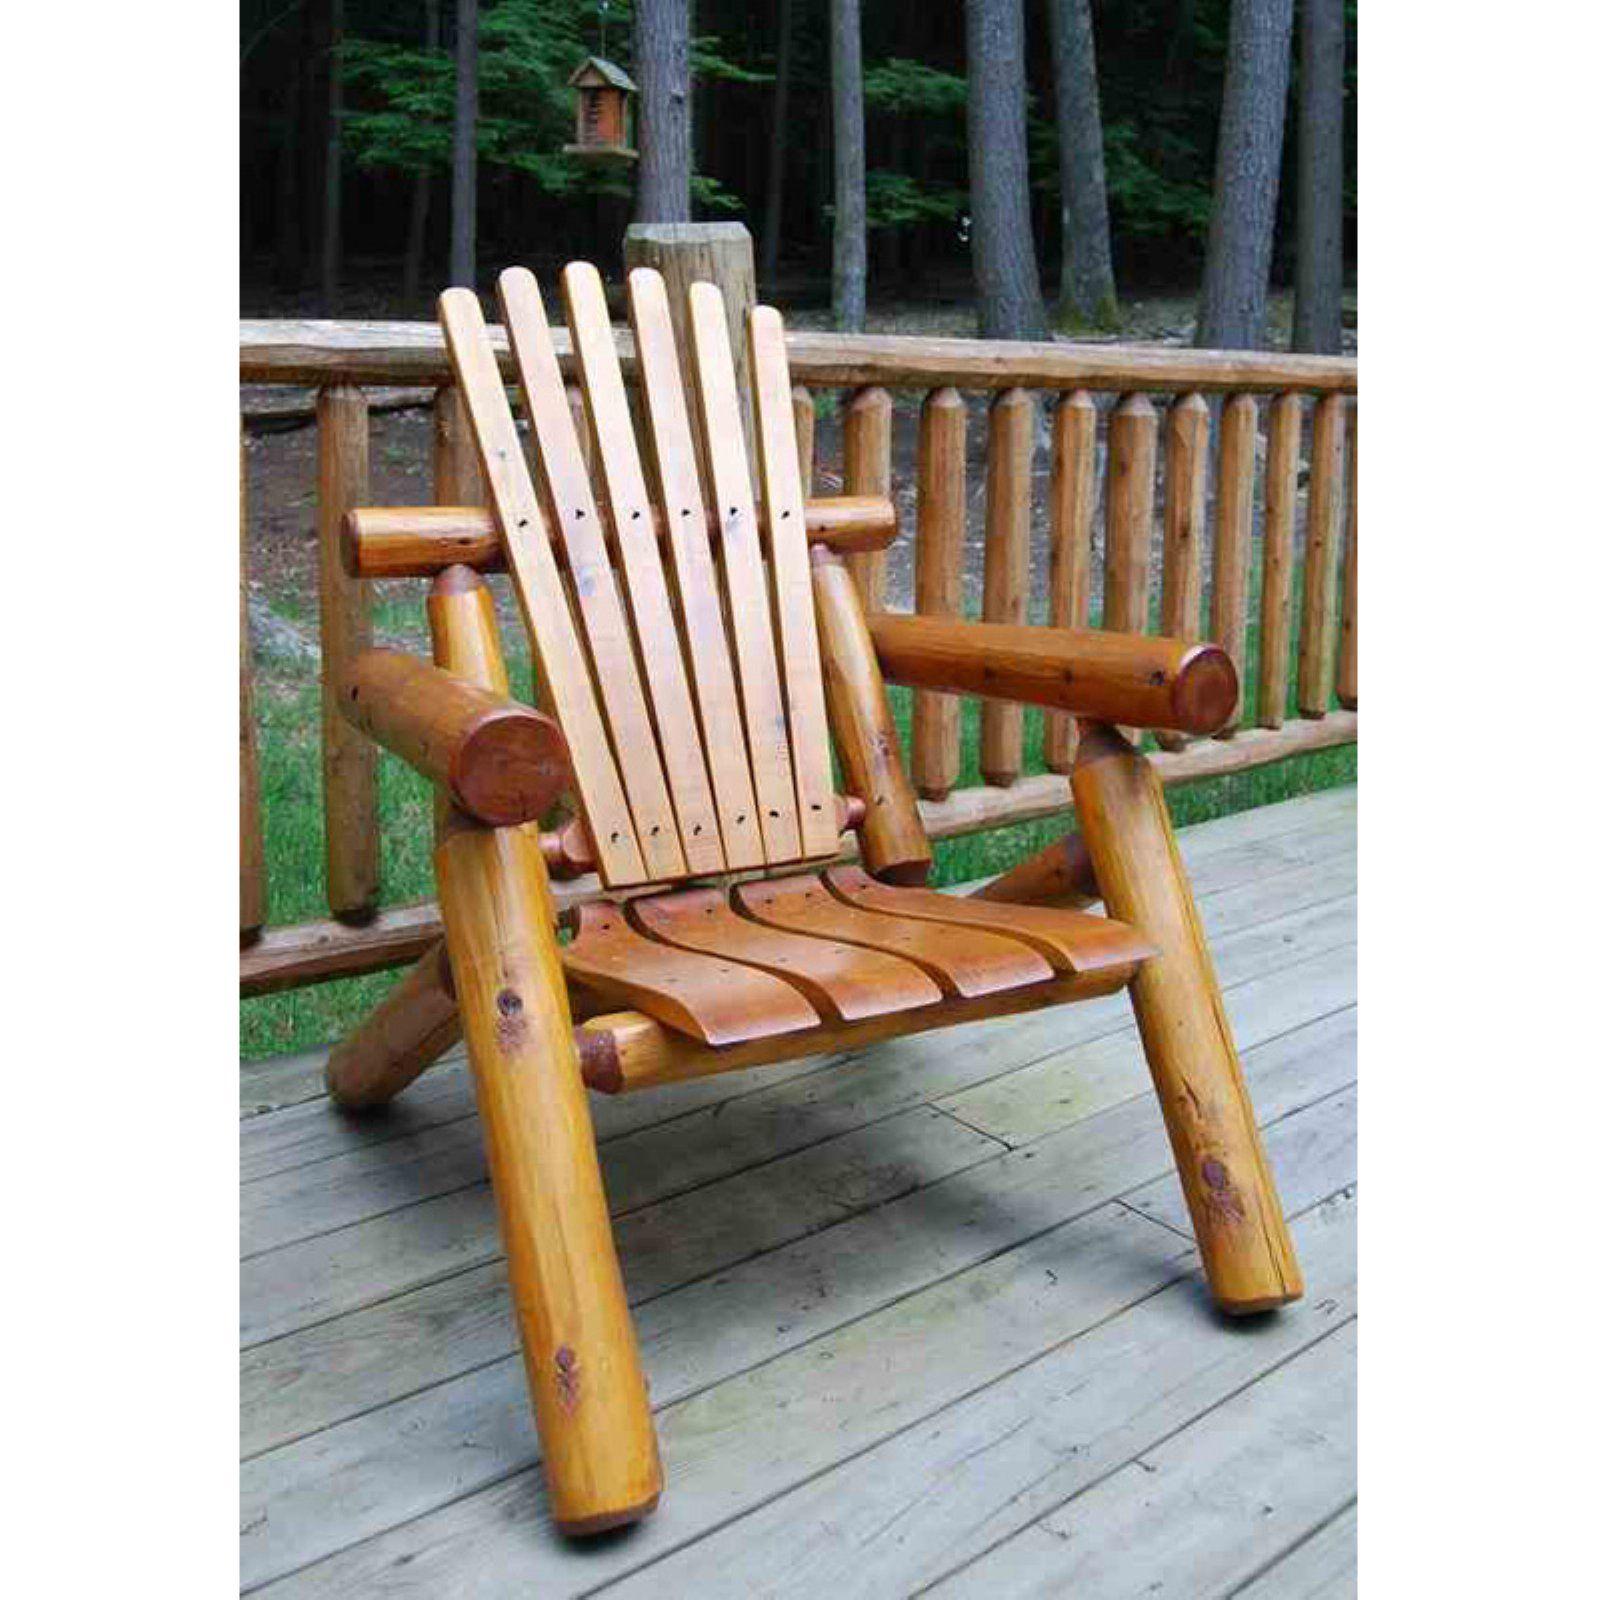 Heavy Duty Sun Lounger, Outdoor Briar Hill White Cedar Adirondack Chair Wood Adirondack Chairs Adirondack Chairs Rustic Furniture